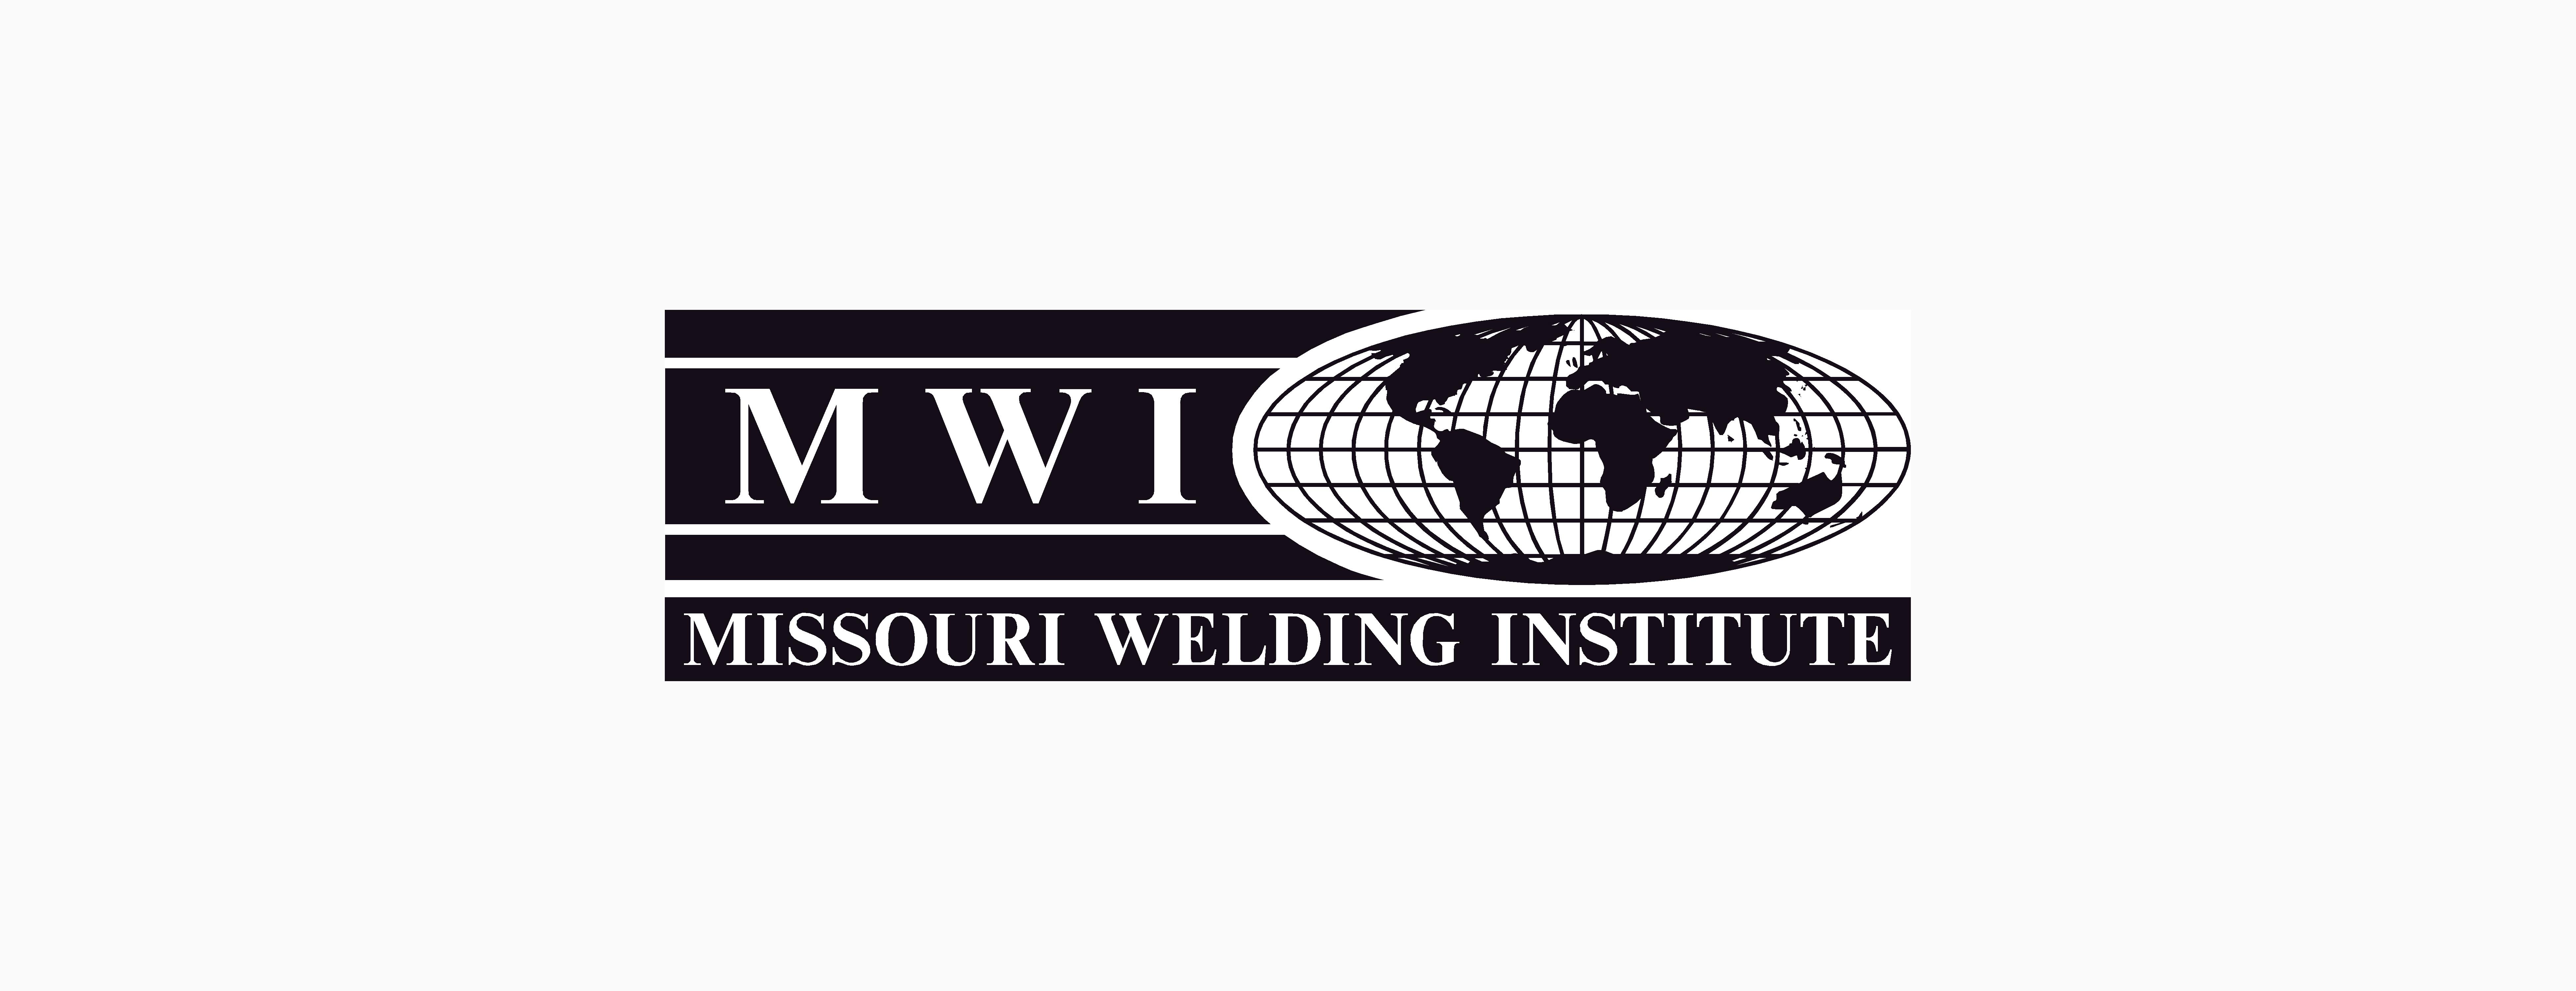 Missouri Welding Institute Nevada Mo